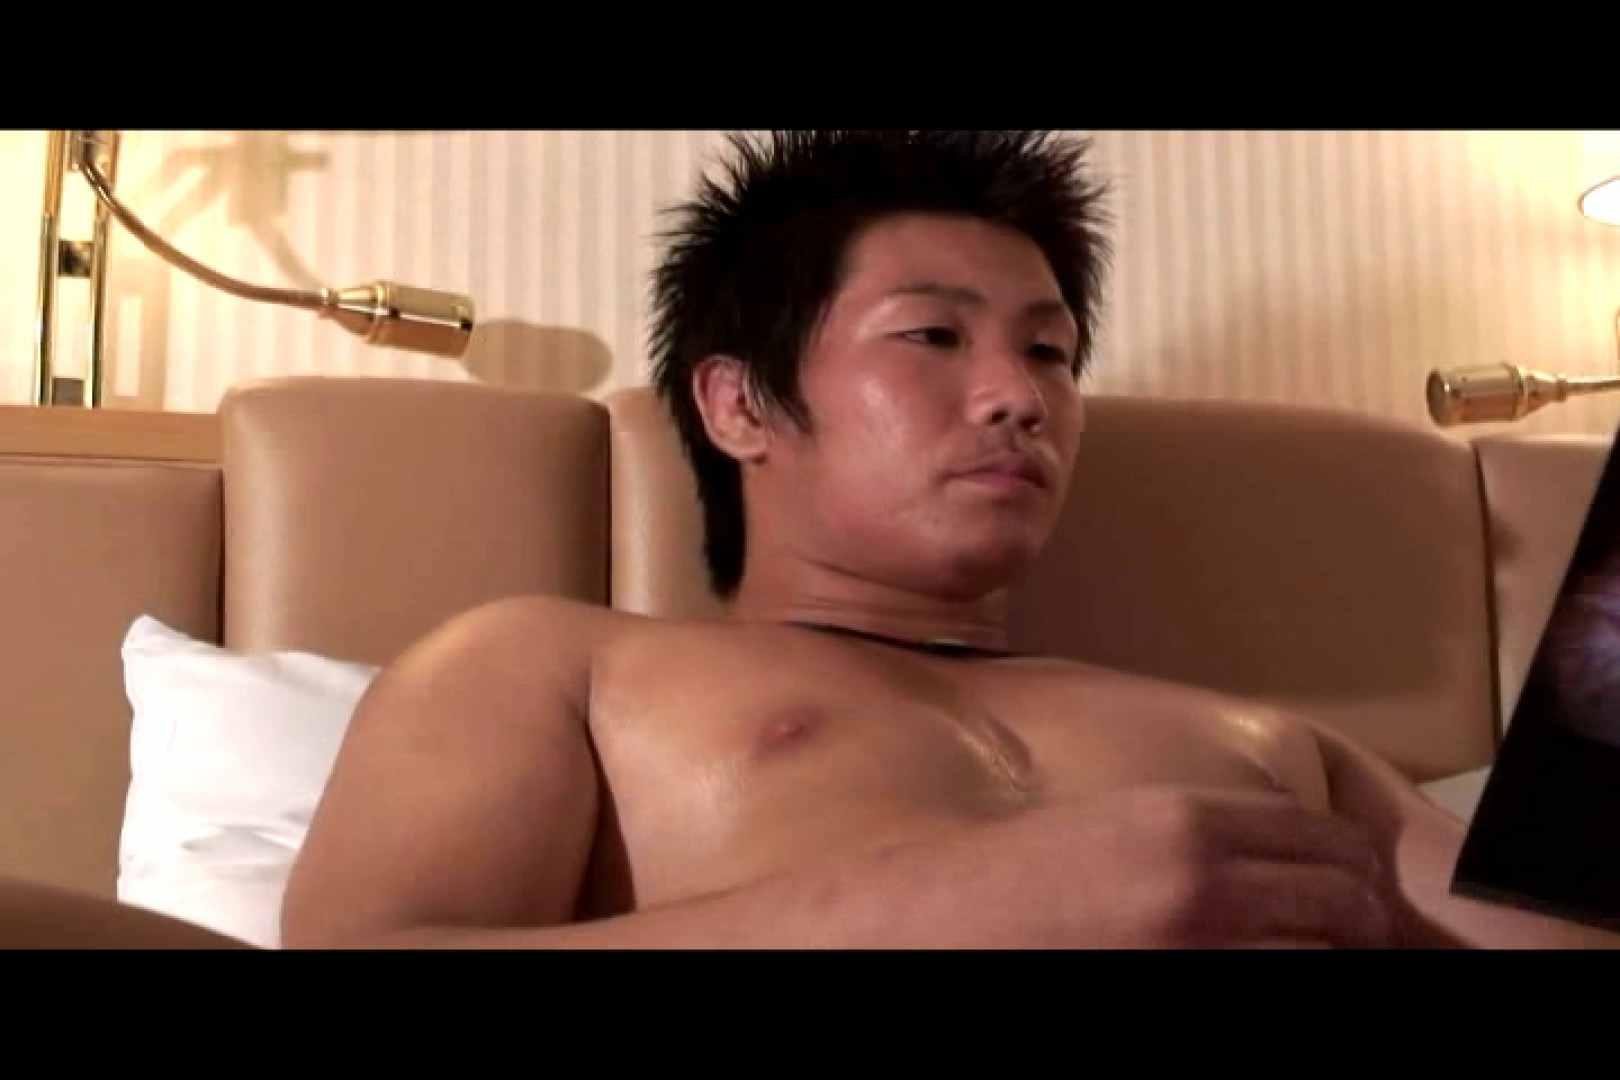 Bistro「イケメン」~Mokkori和風仕立て~vol.03 オナニー専門男子 ゲイ丸見え画像 67画像 6